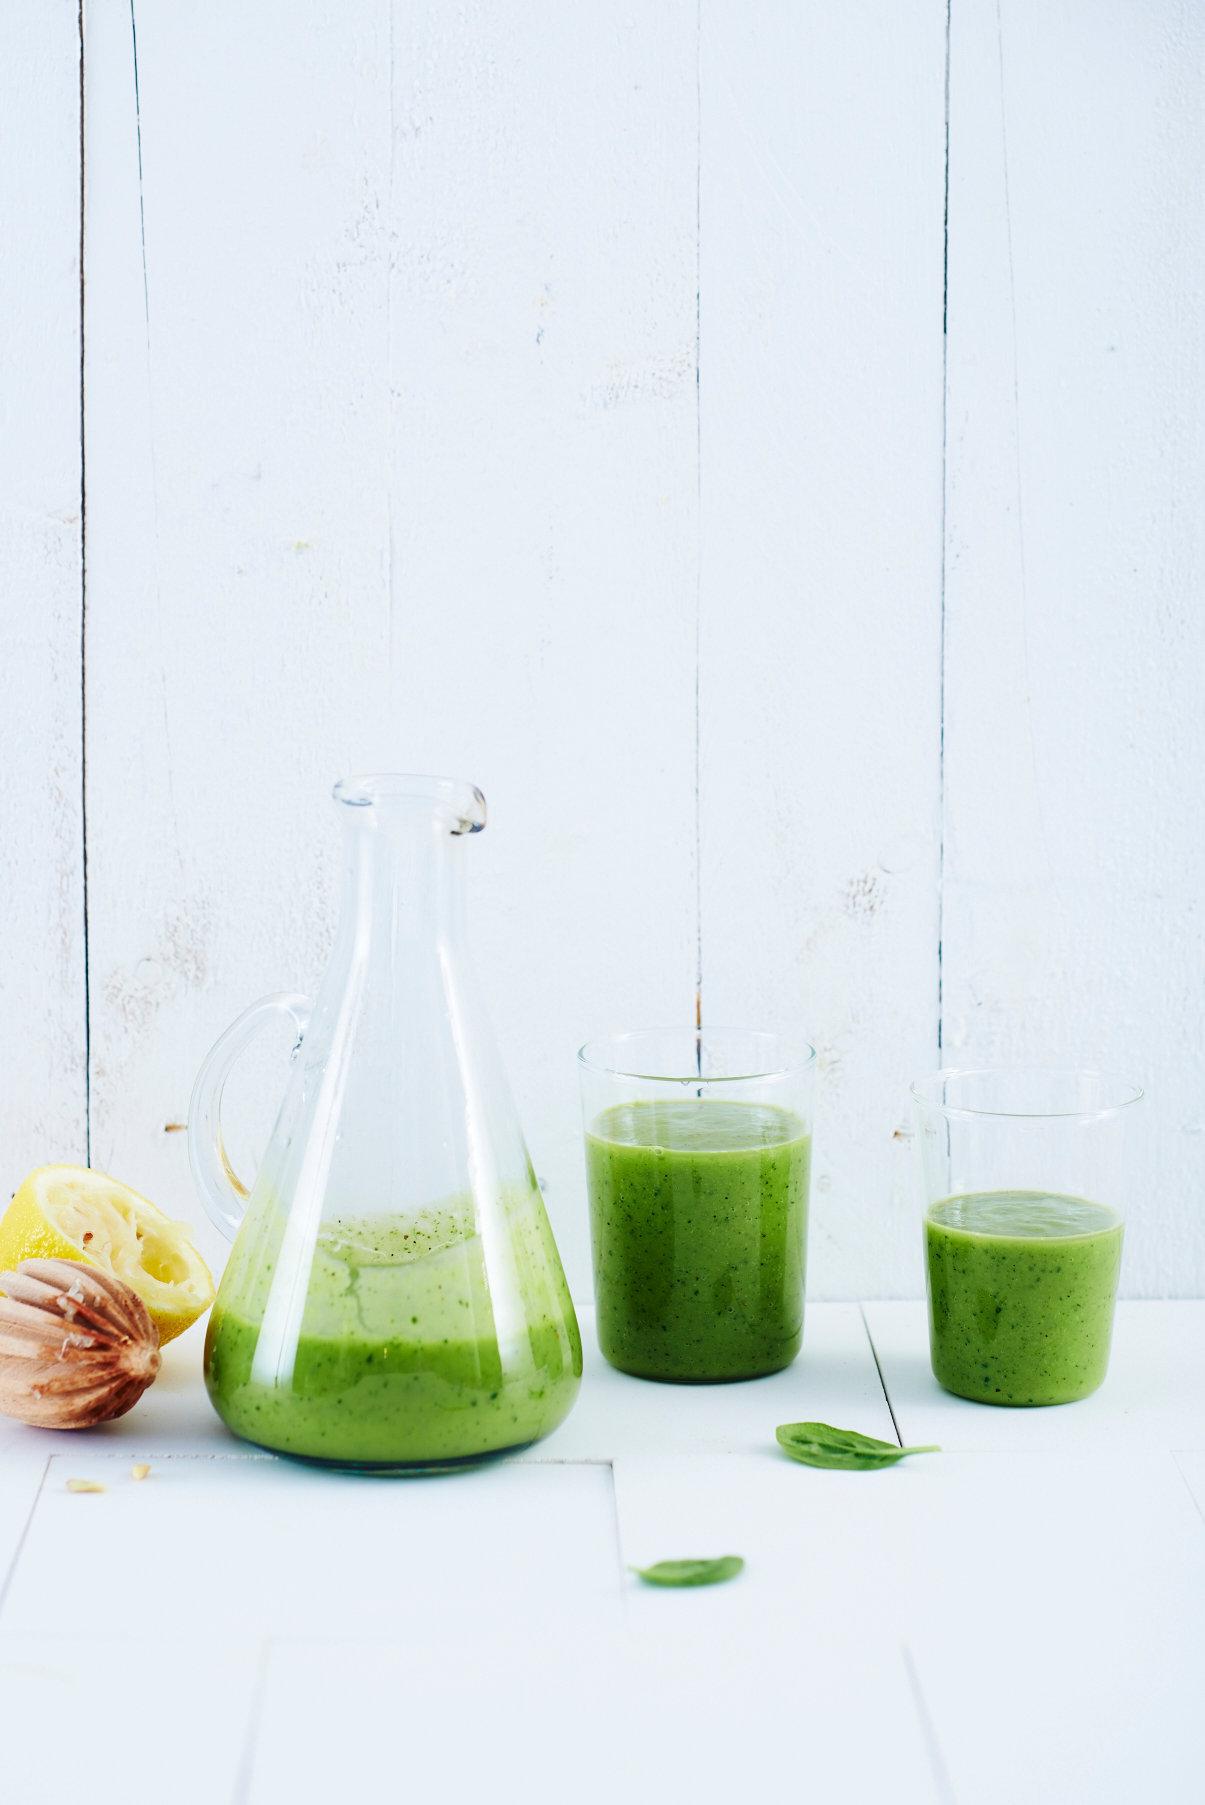 detox-boisson-green-smoothie-22497.jpg